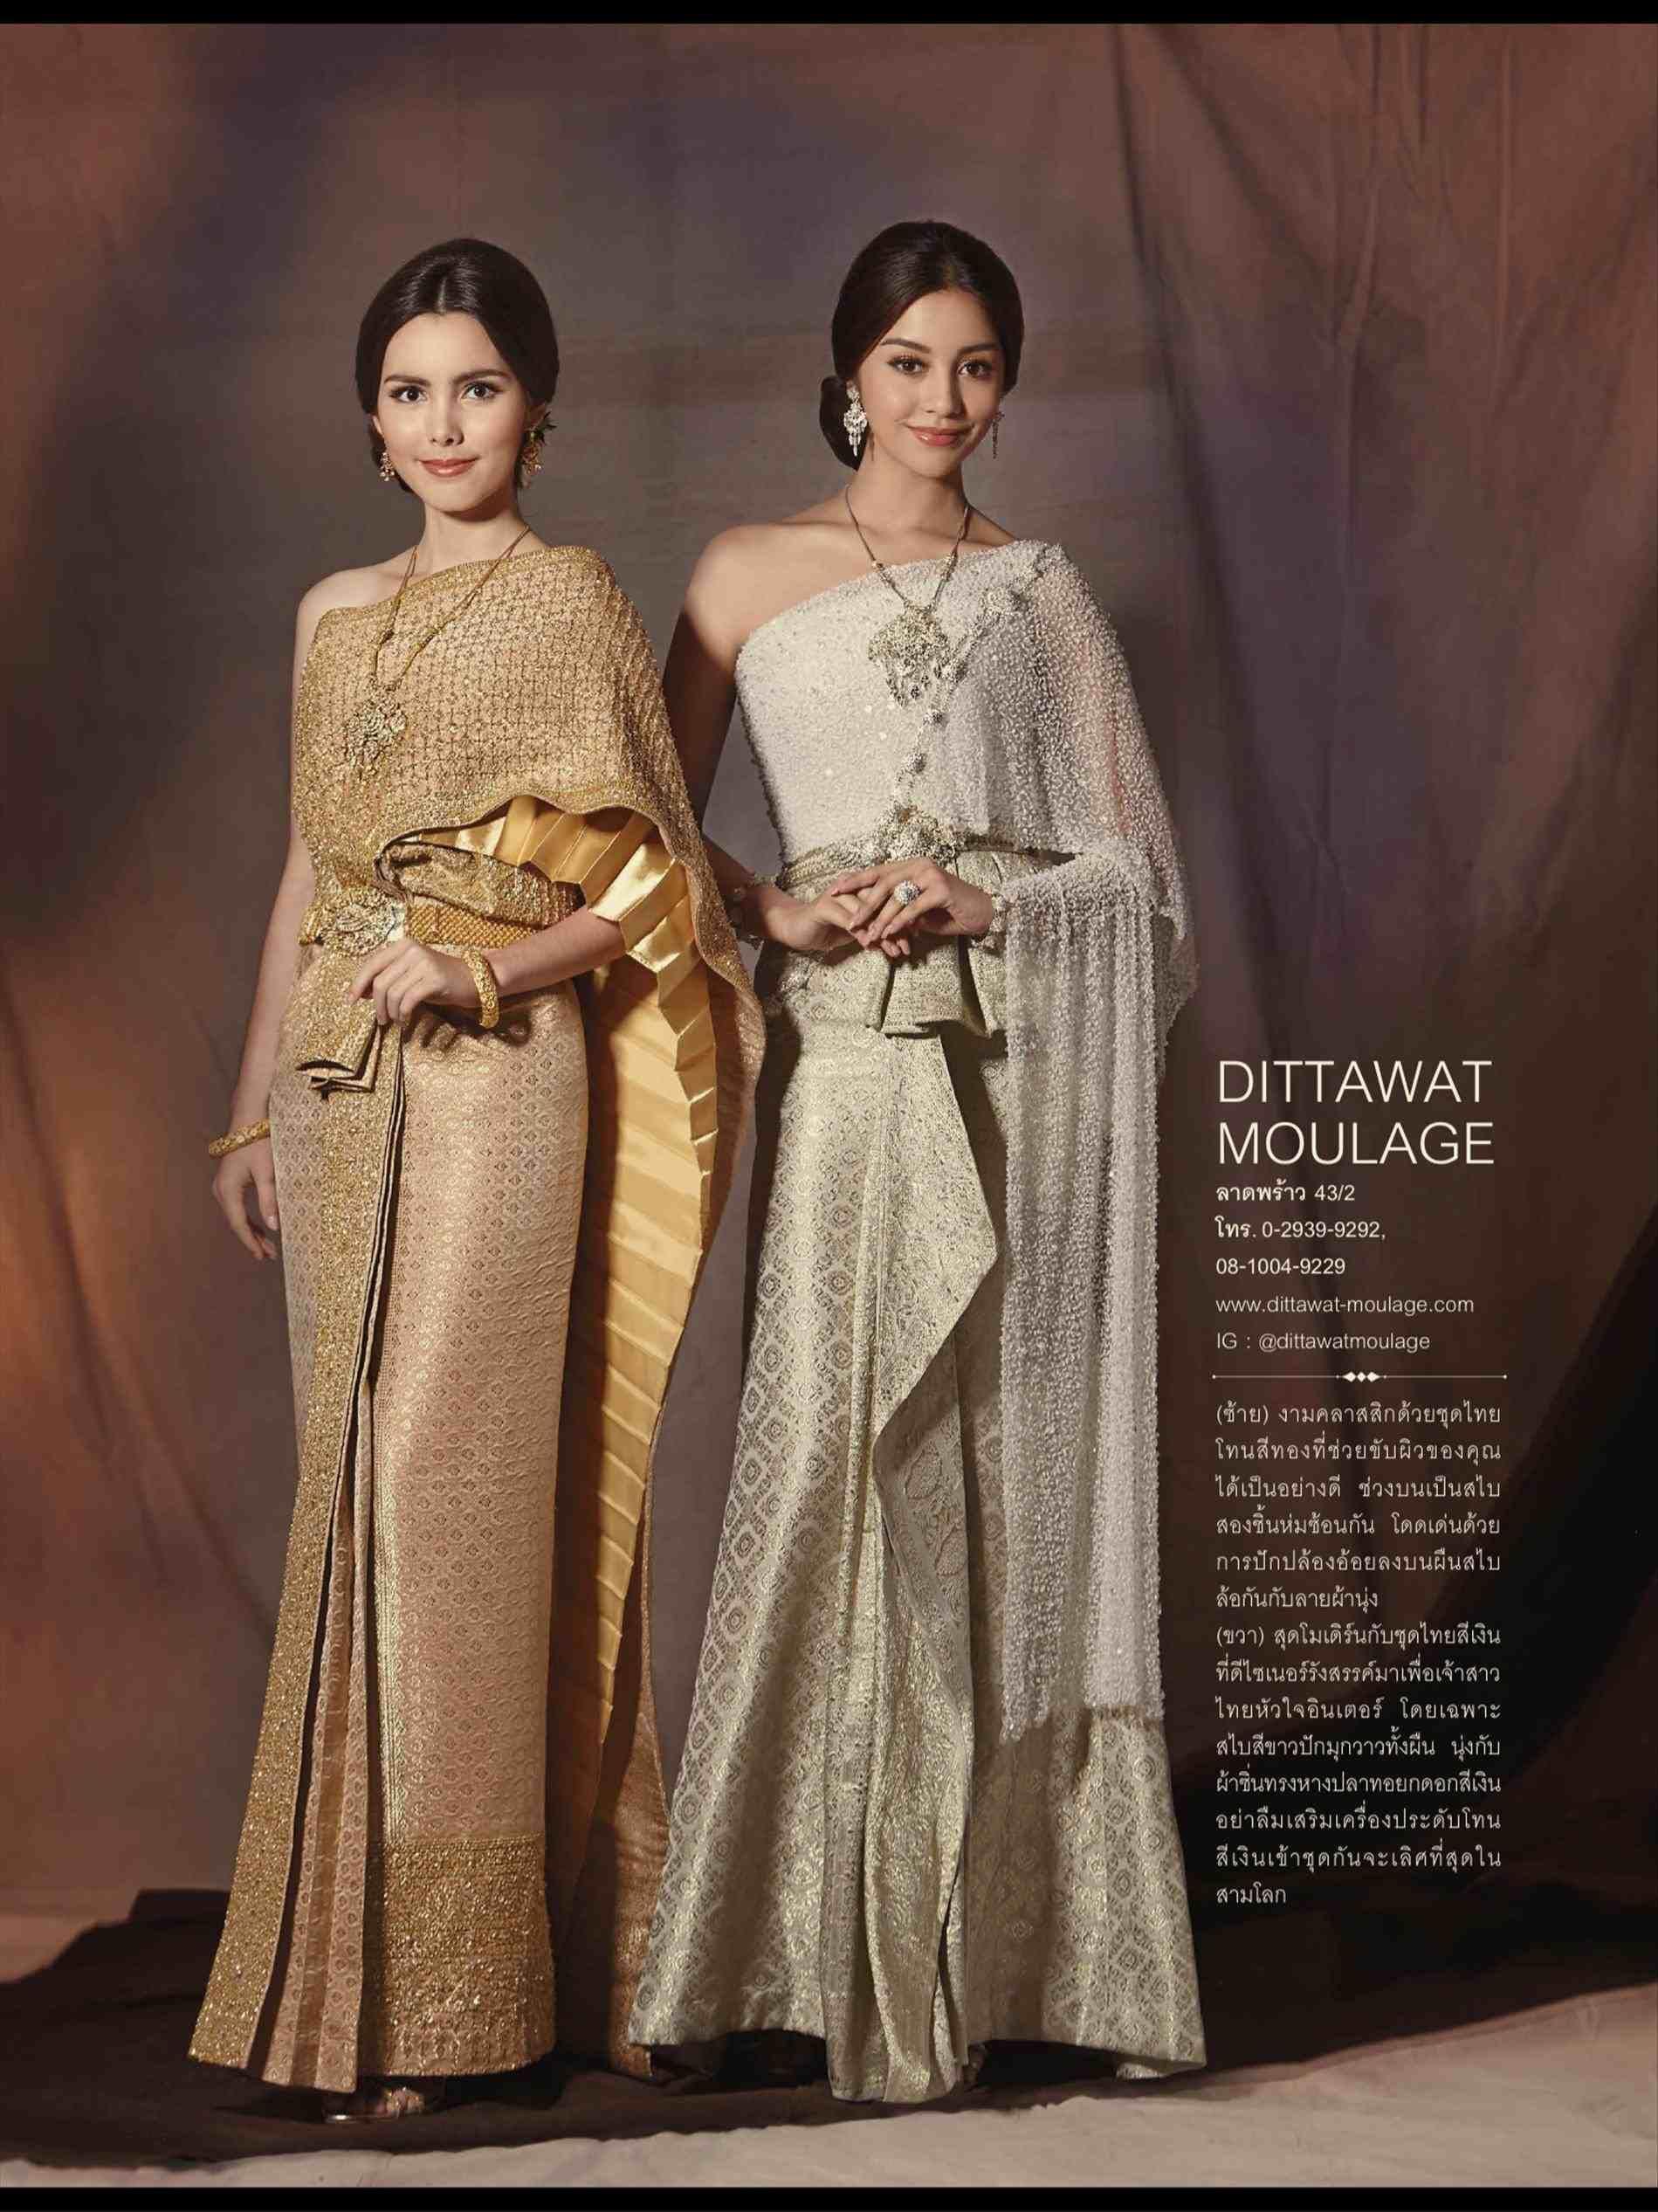 Thai wedding dress in traditional dress pinterest thai